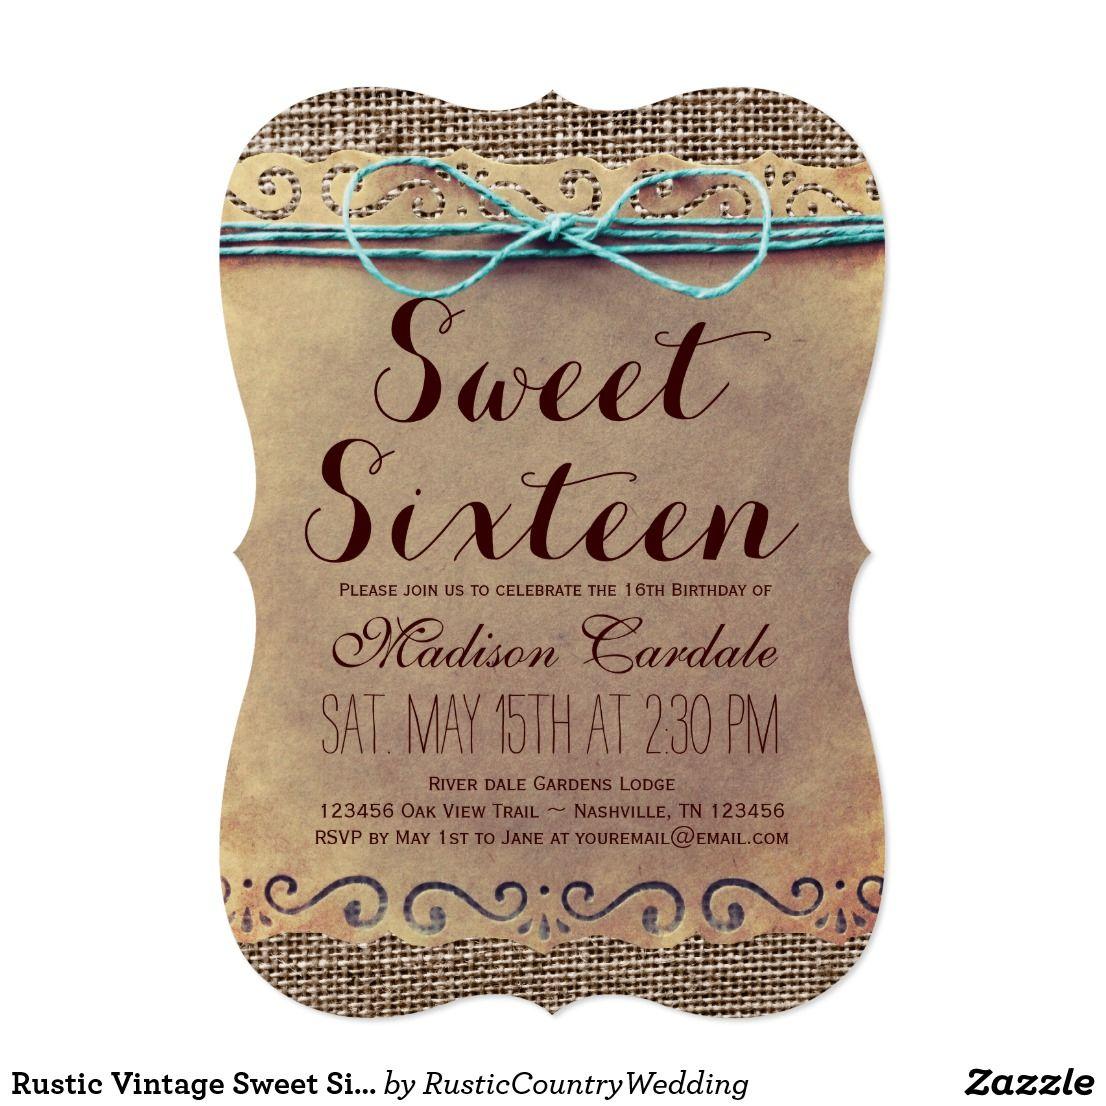 Rustic Vintage Sweet Sixteen Birthday Invitations. Use this template ...